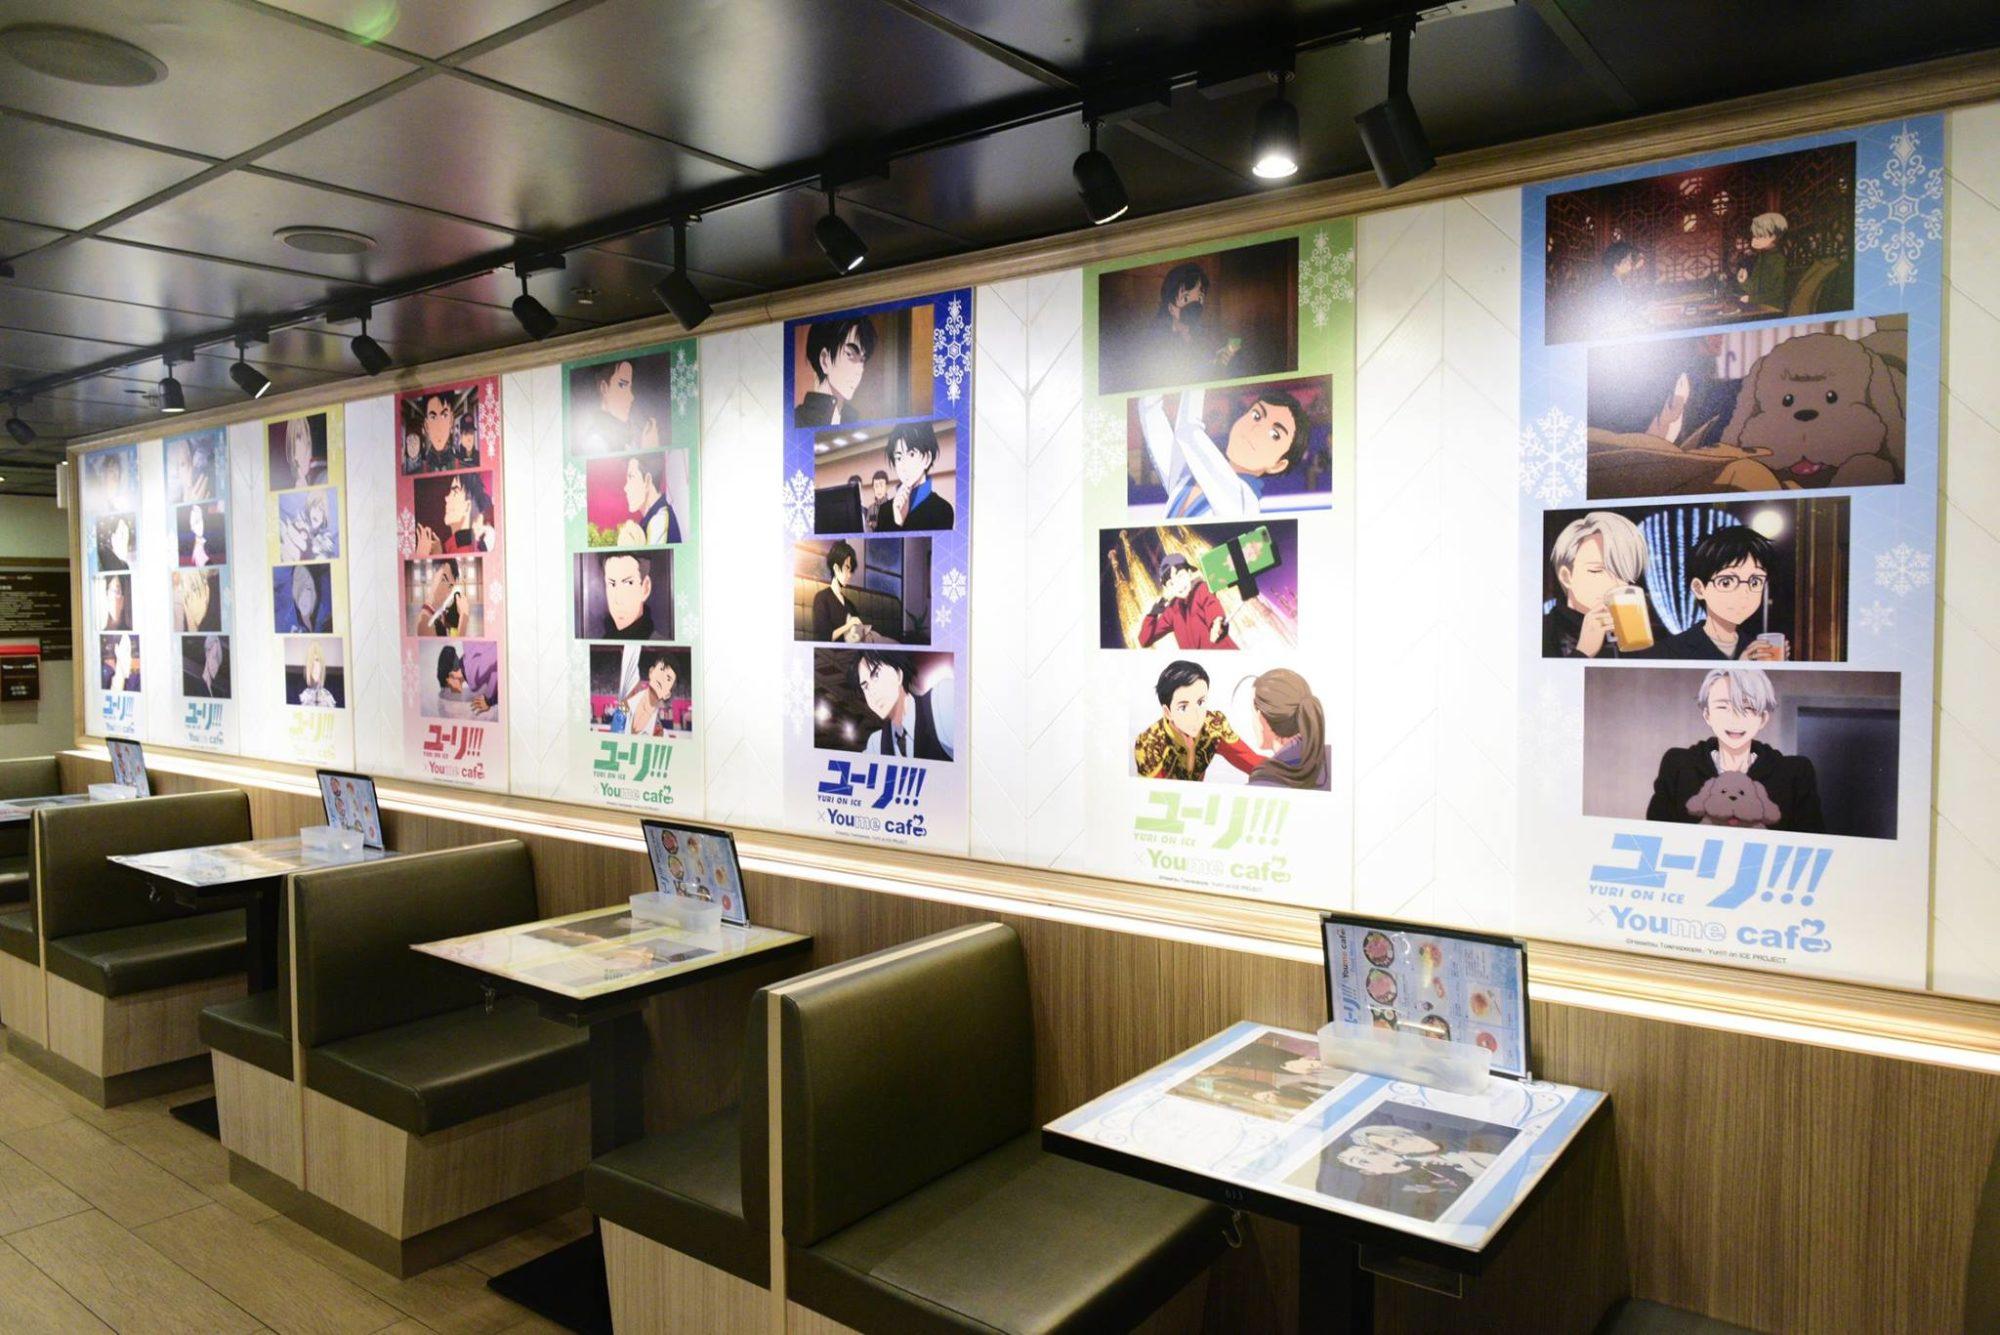 Youme Cafe